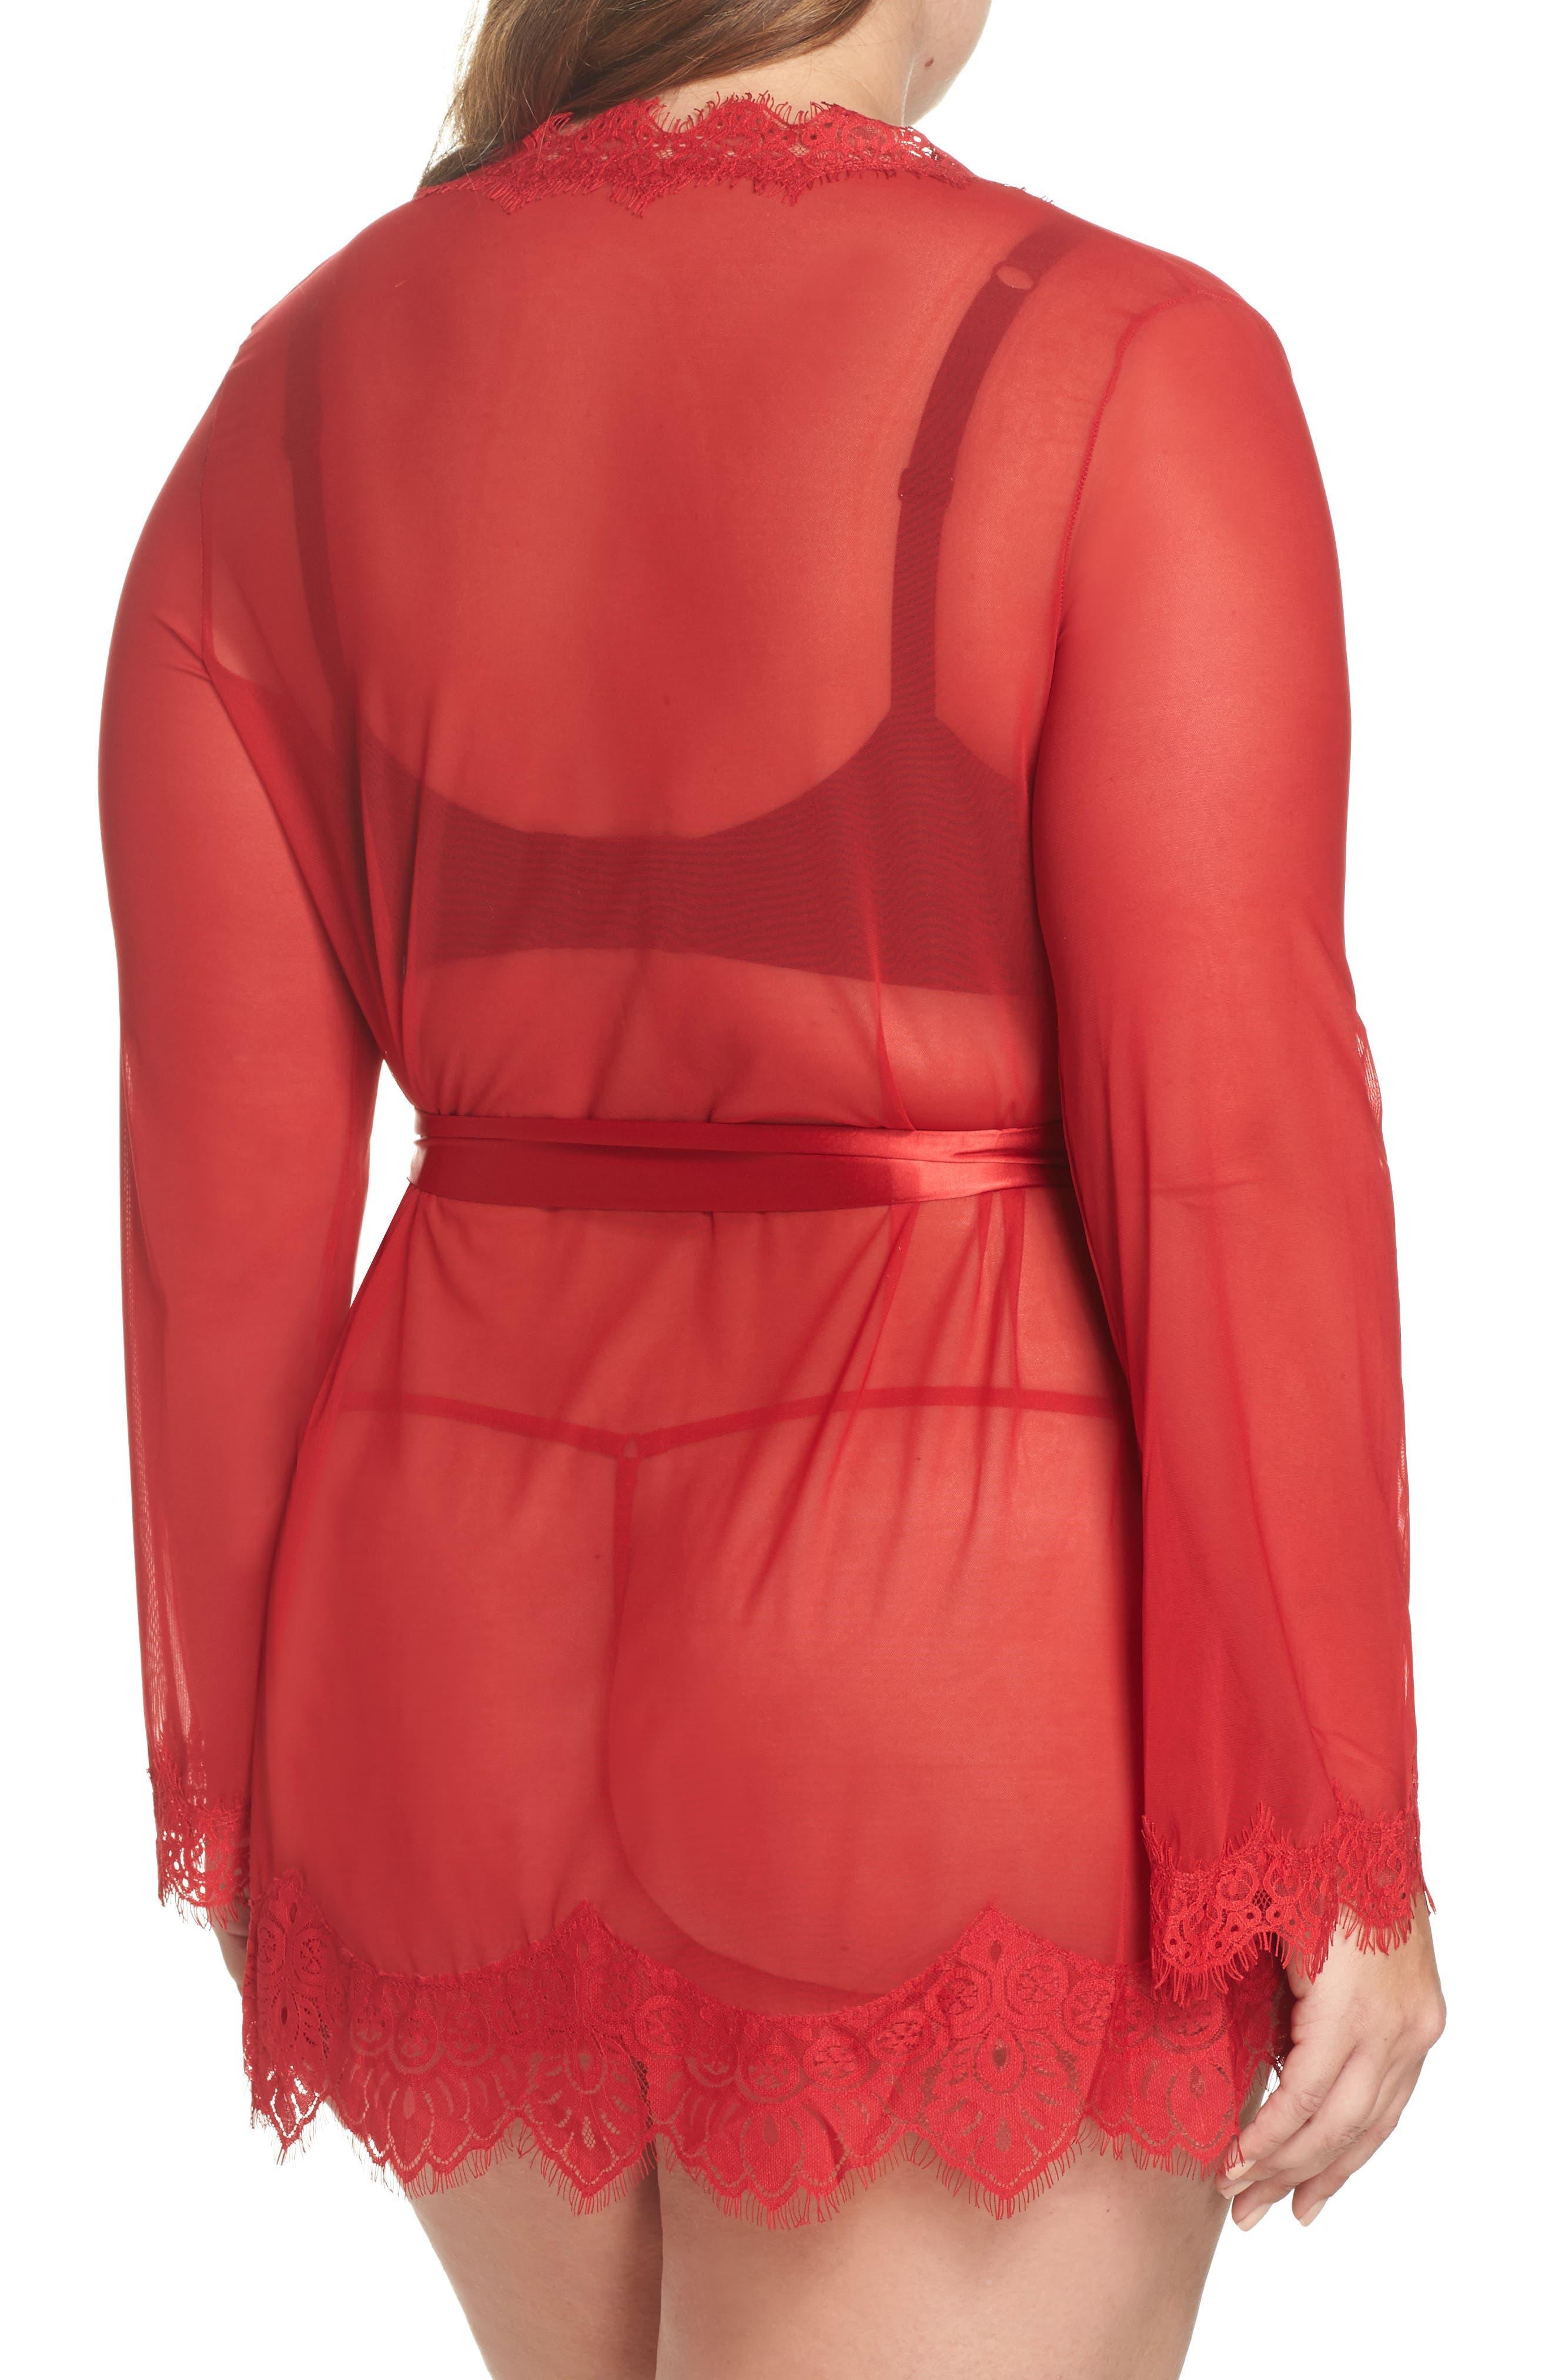 Alternate Image 2  - Oh La La Cheri Eyelash Lace Robe & G-String (Plus Size)